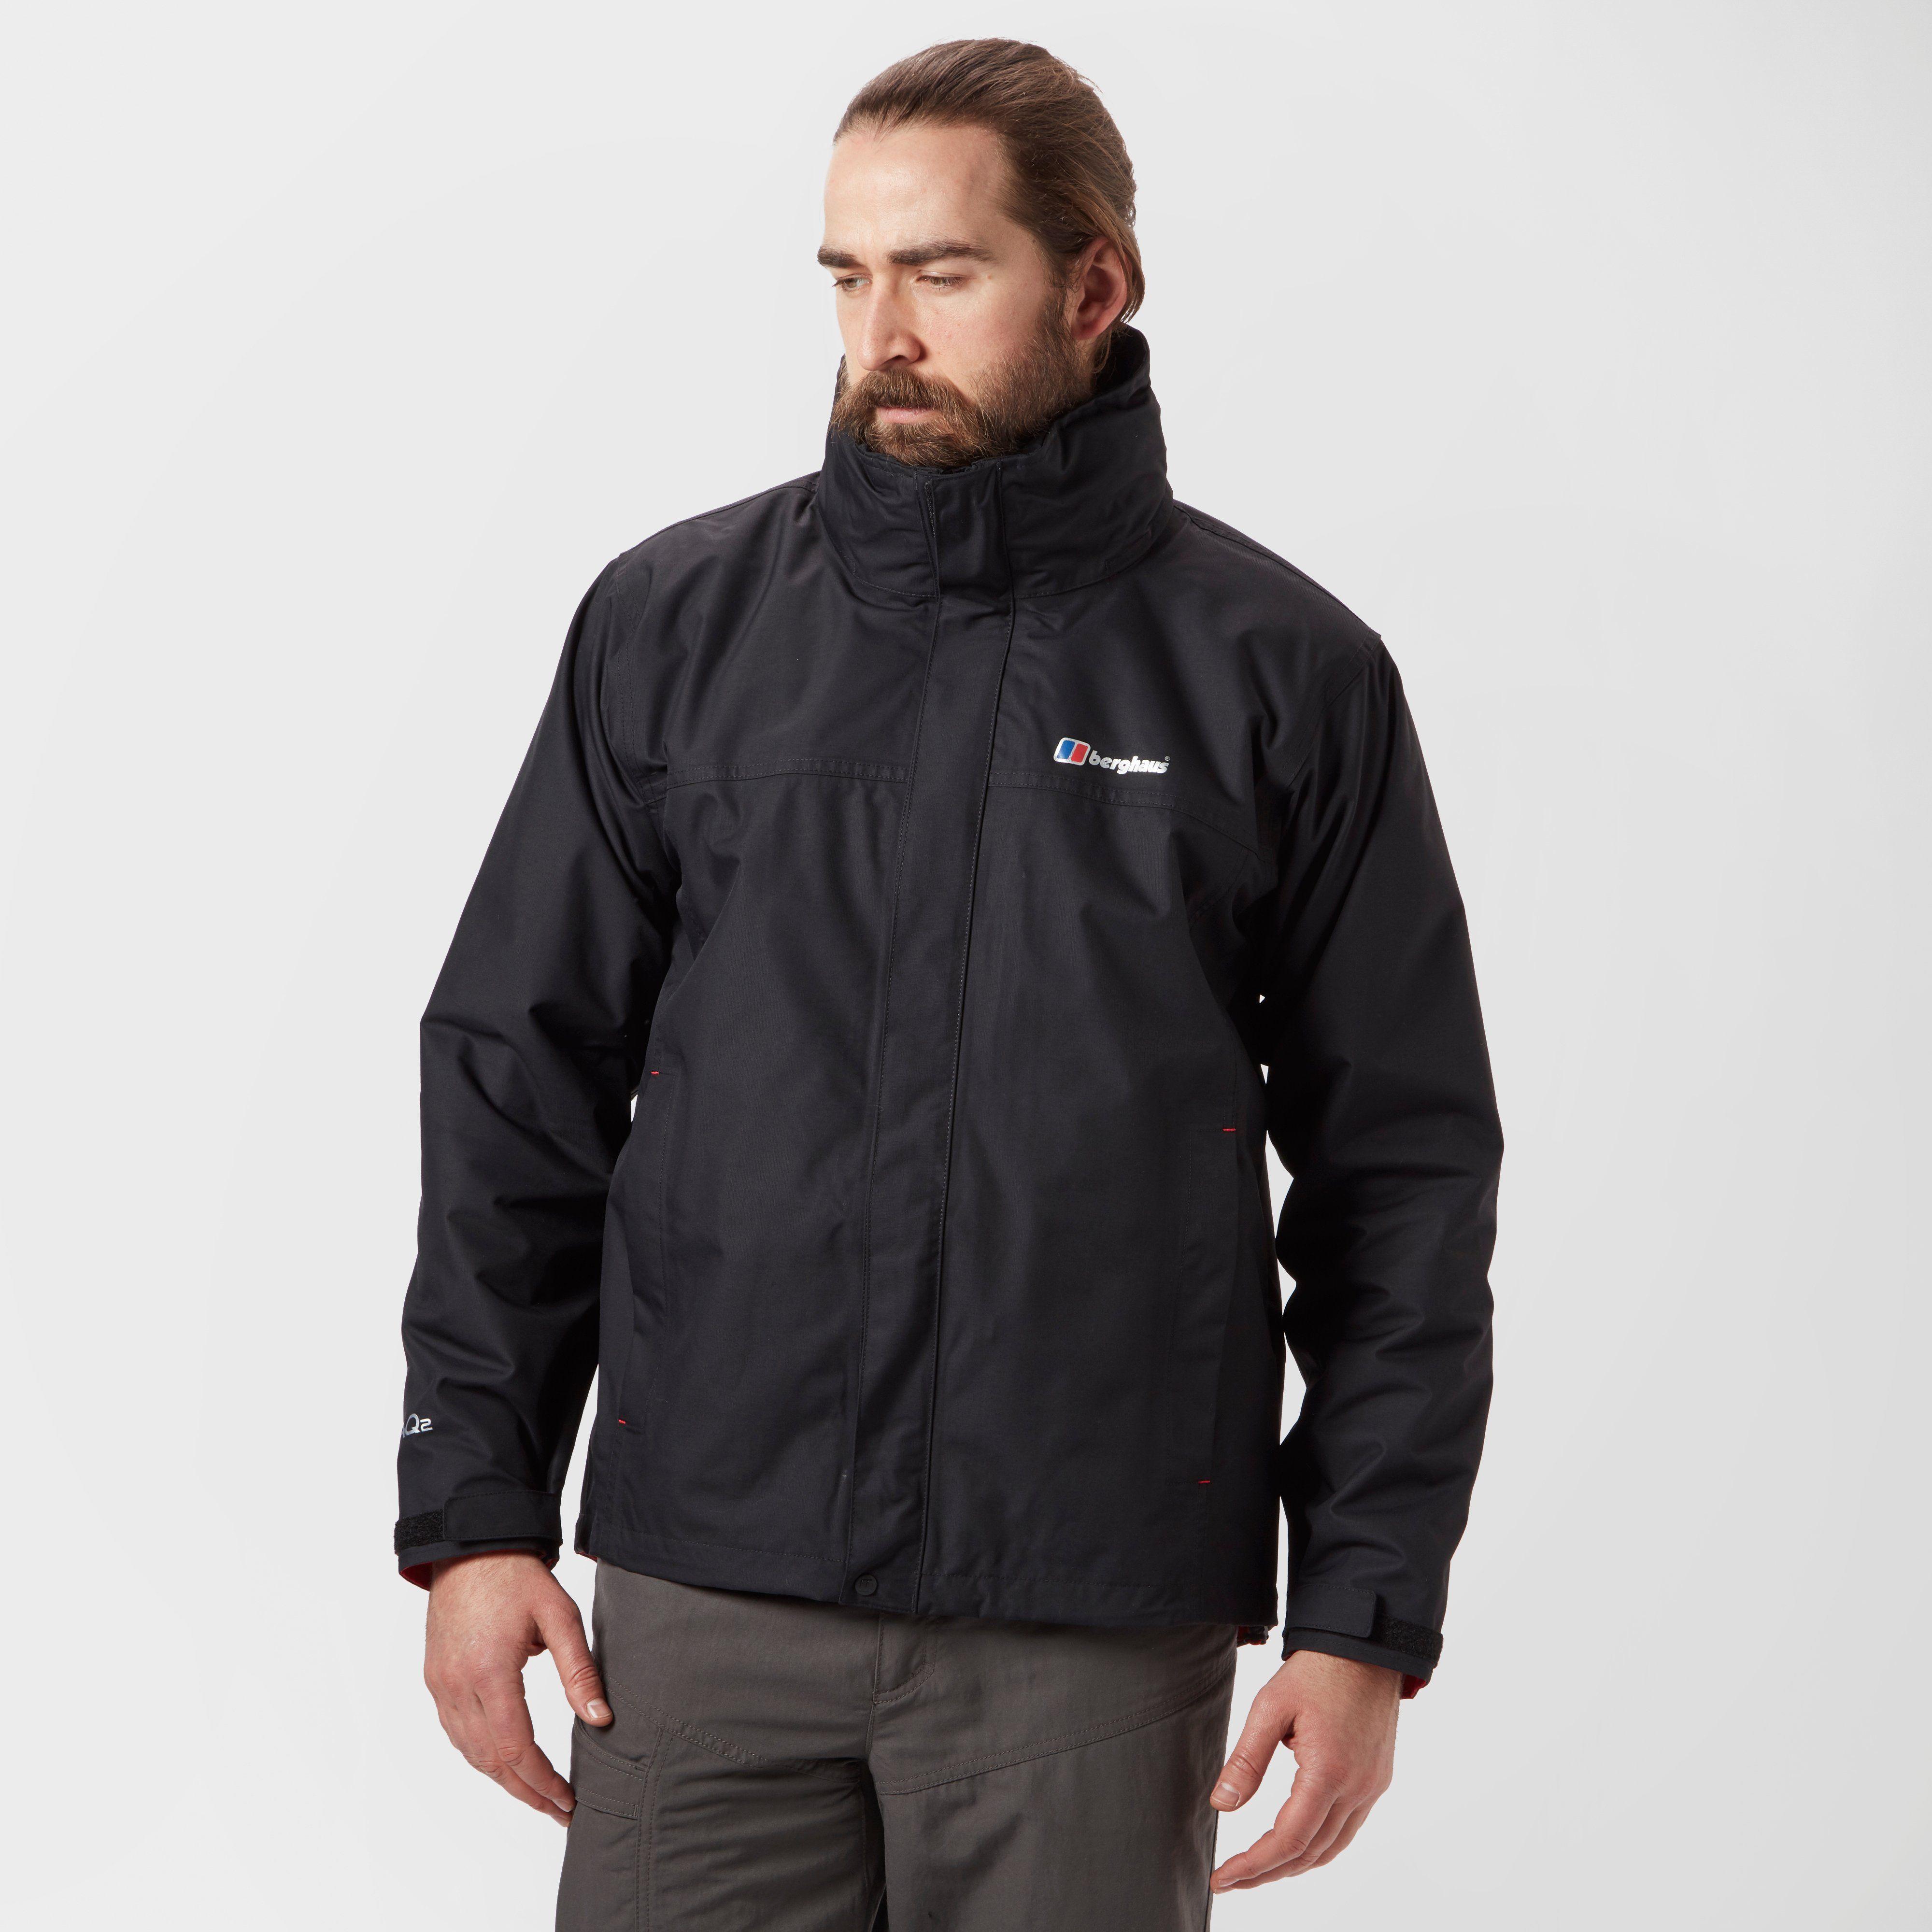 BERGHAUS Men's RG Delta 3 in 1 Jacket